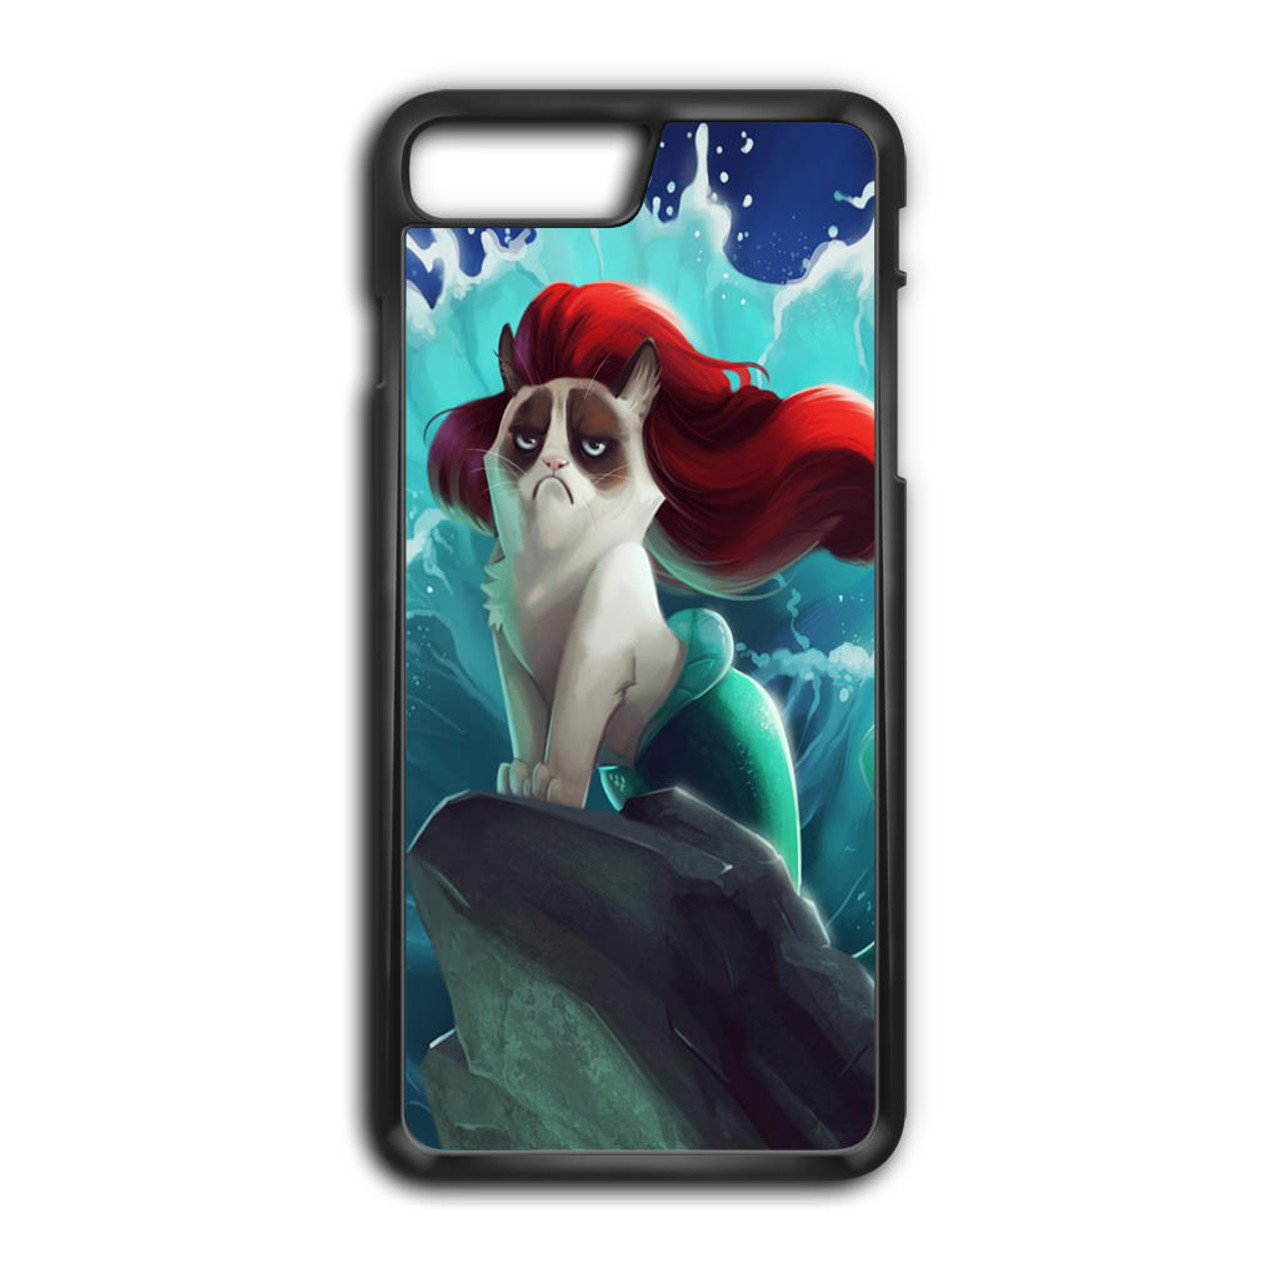 disney phone cases iphone 7